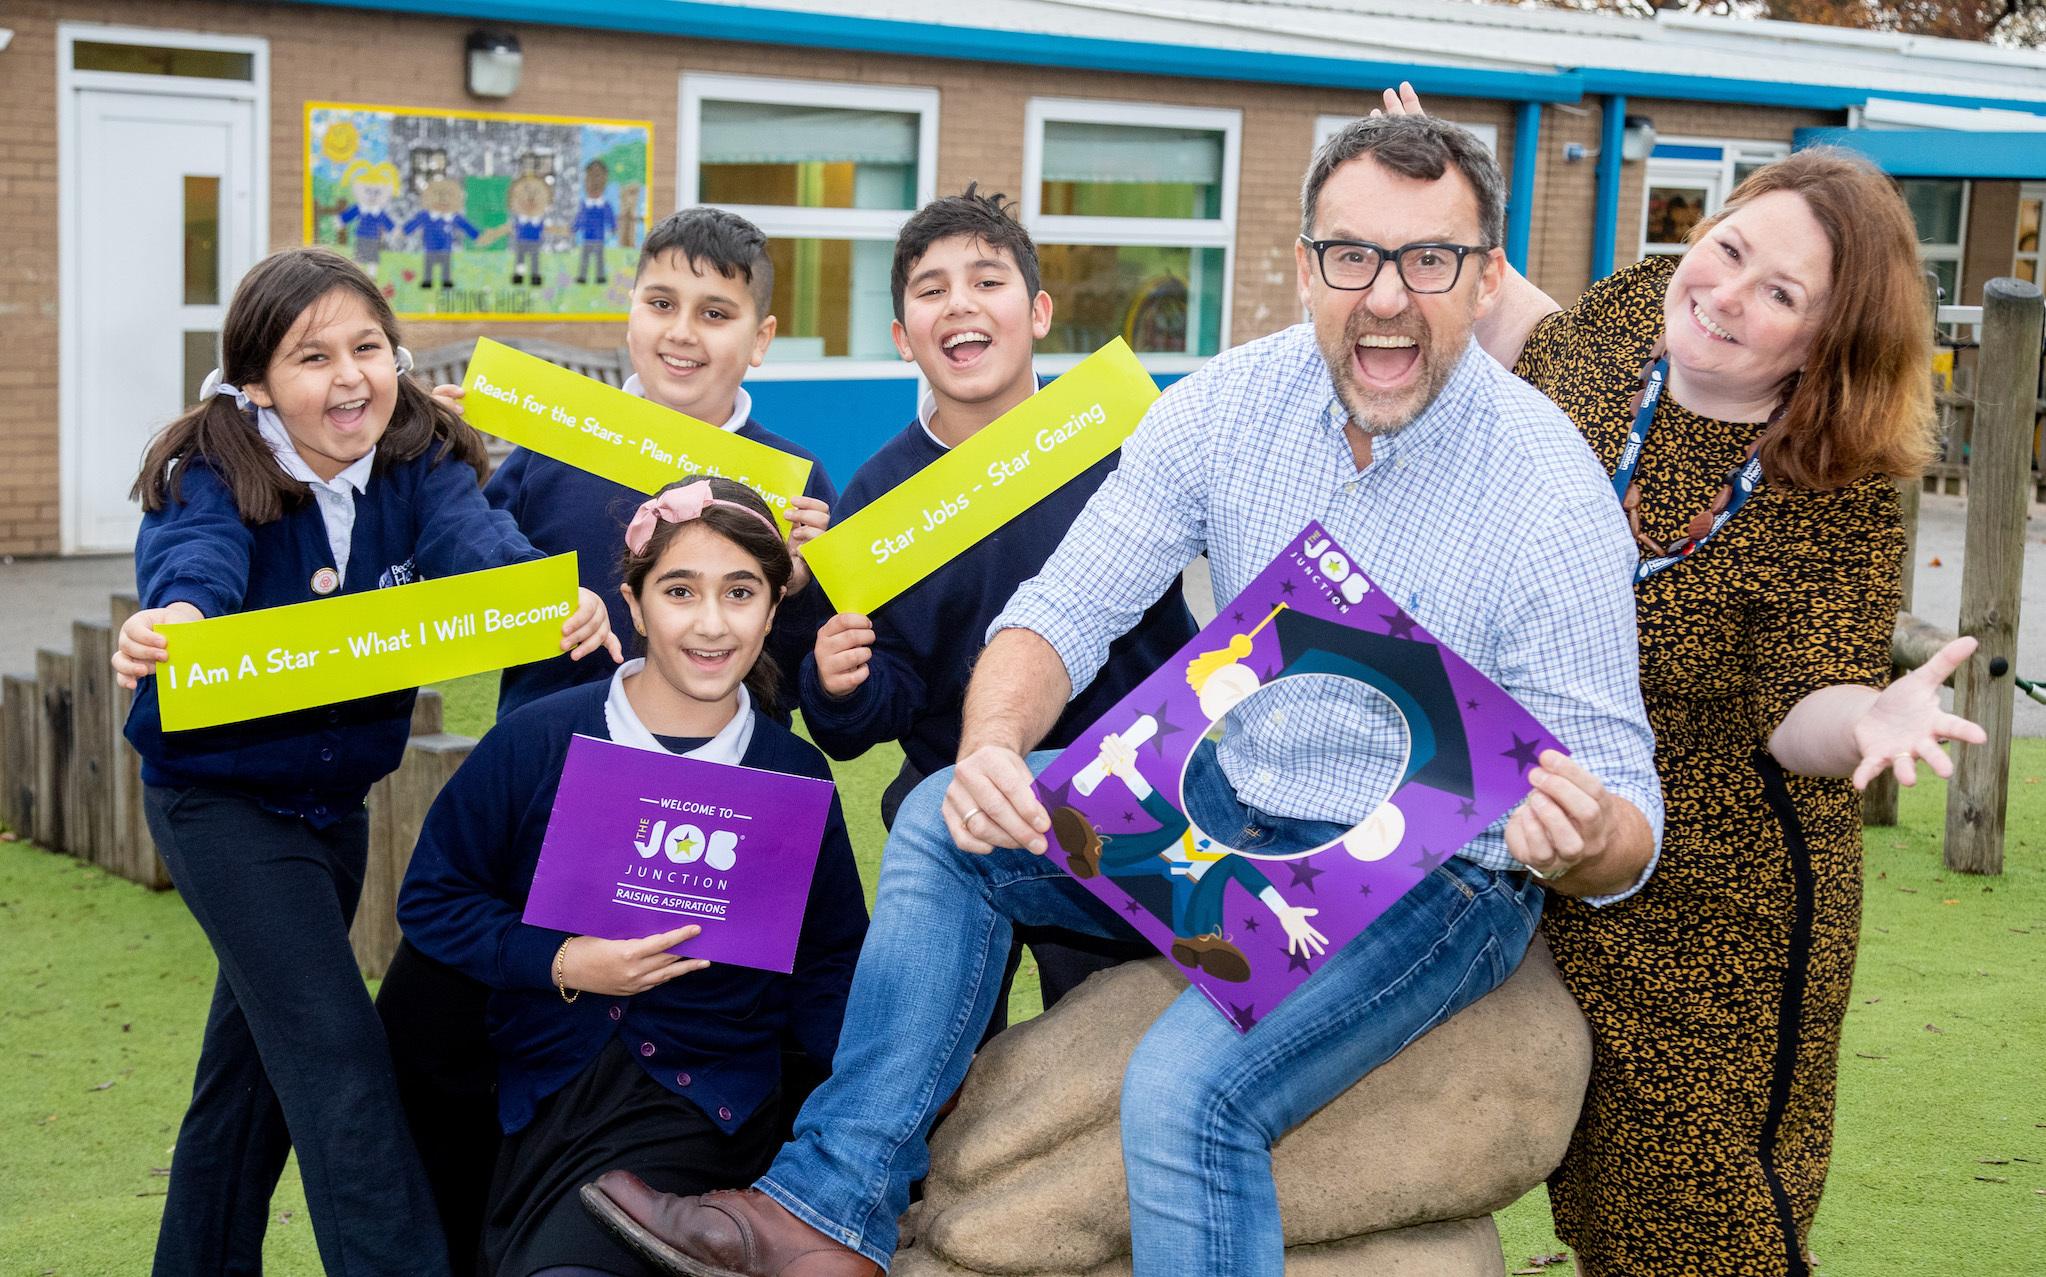 Bradford pupils to get Positive Footprints aspiration training